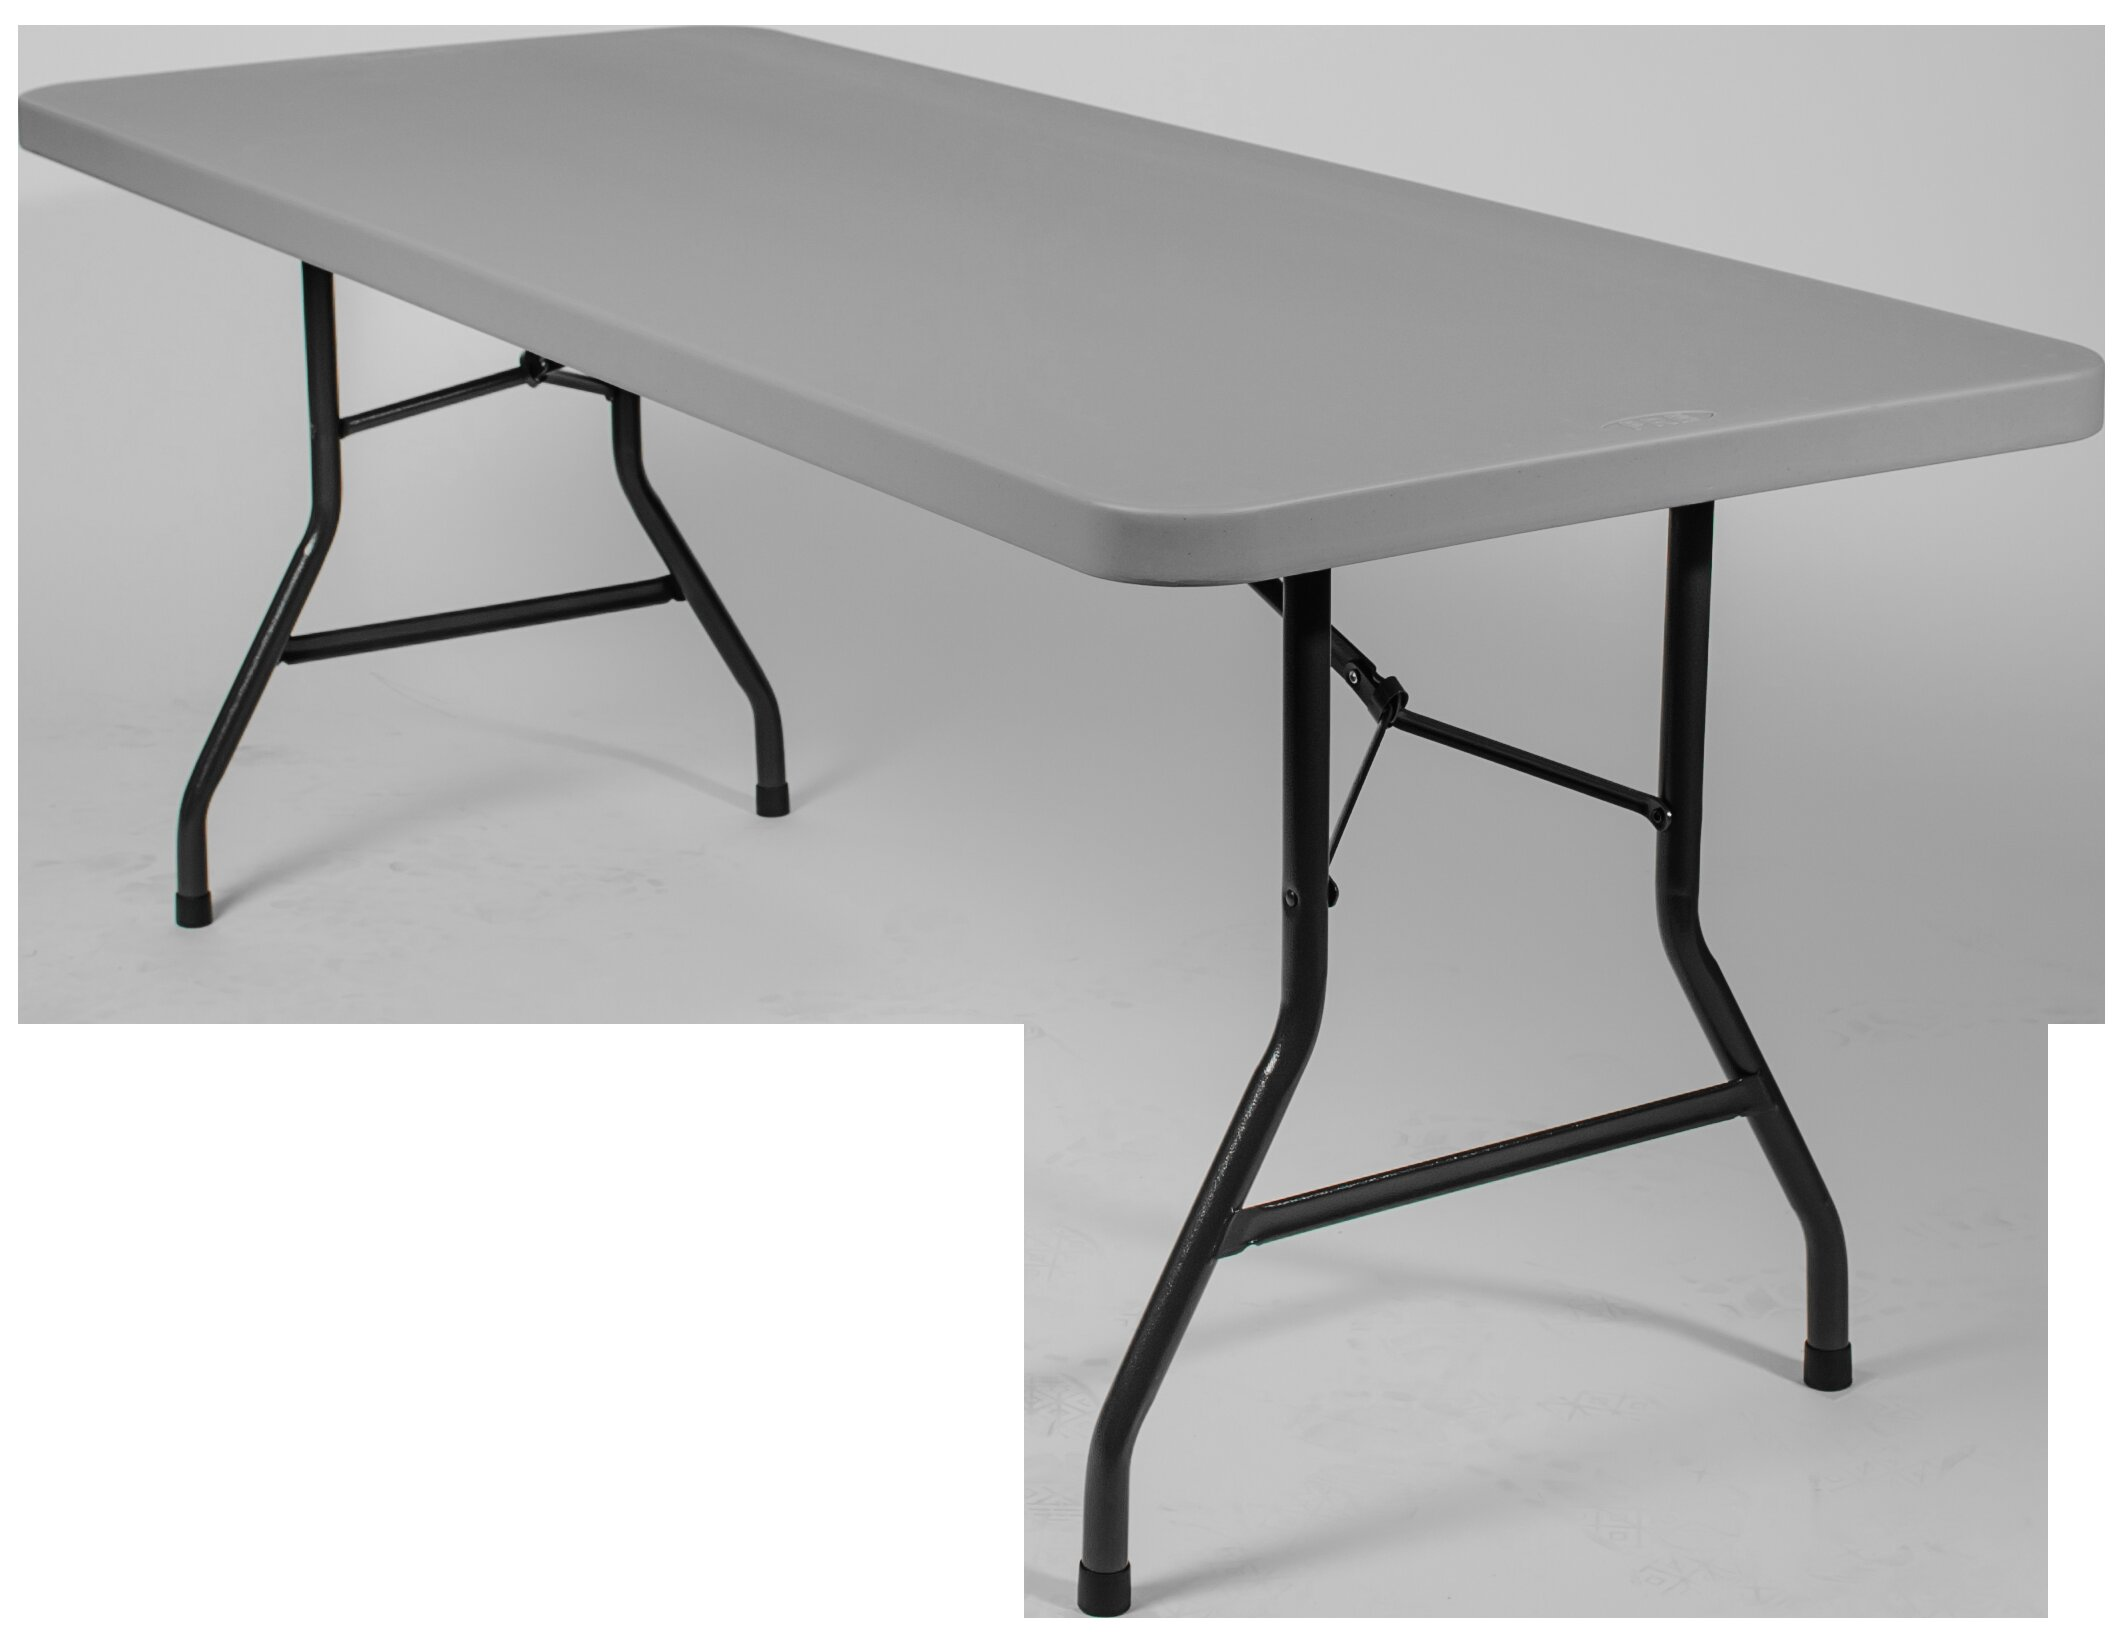 Pre Sales Rhinolite Folding Table Wayfair